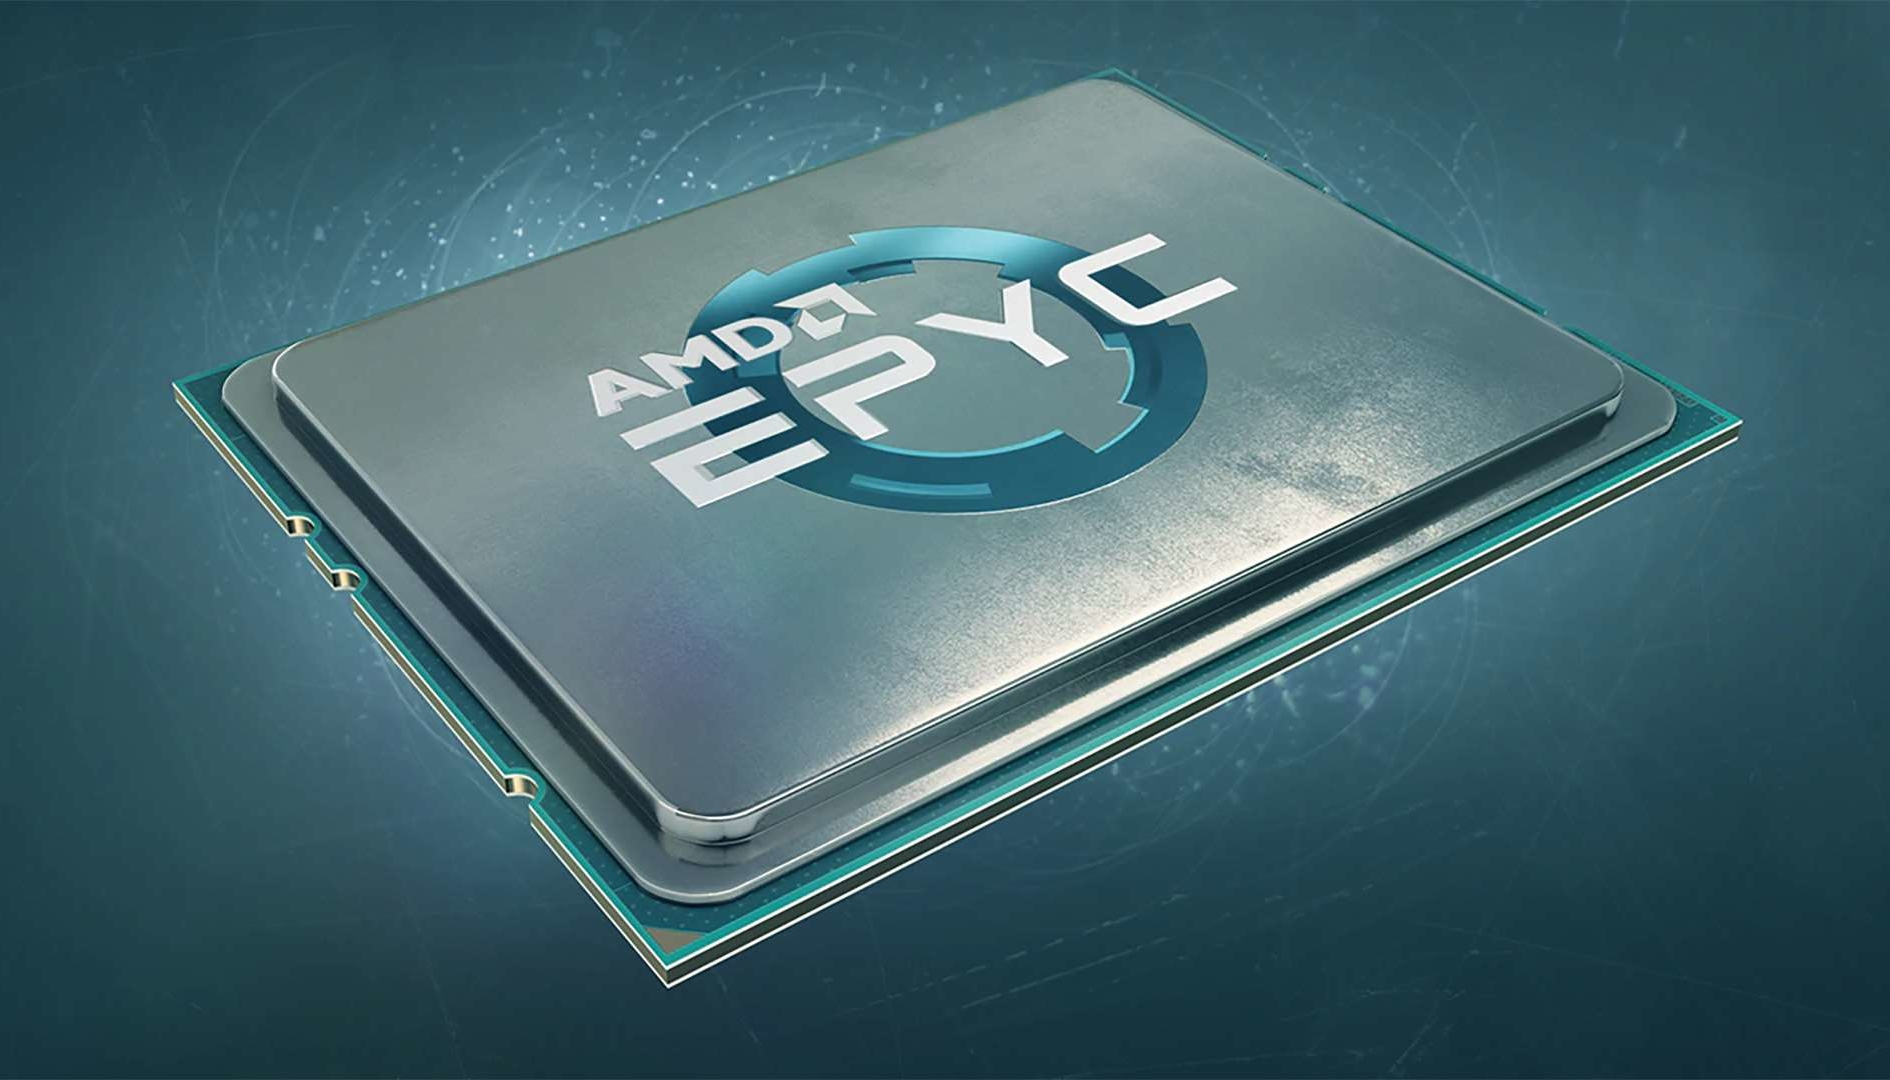 AMD, avvistate le CPU EPYC Milan per la prima volta